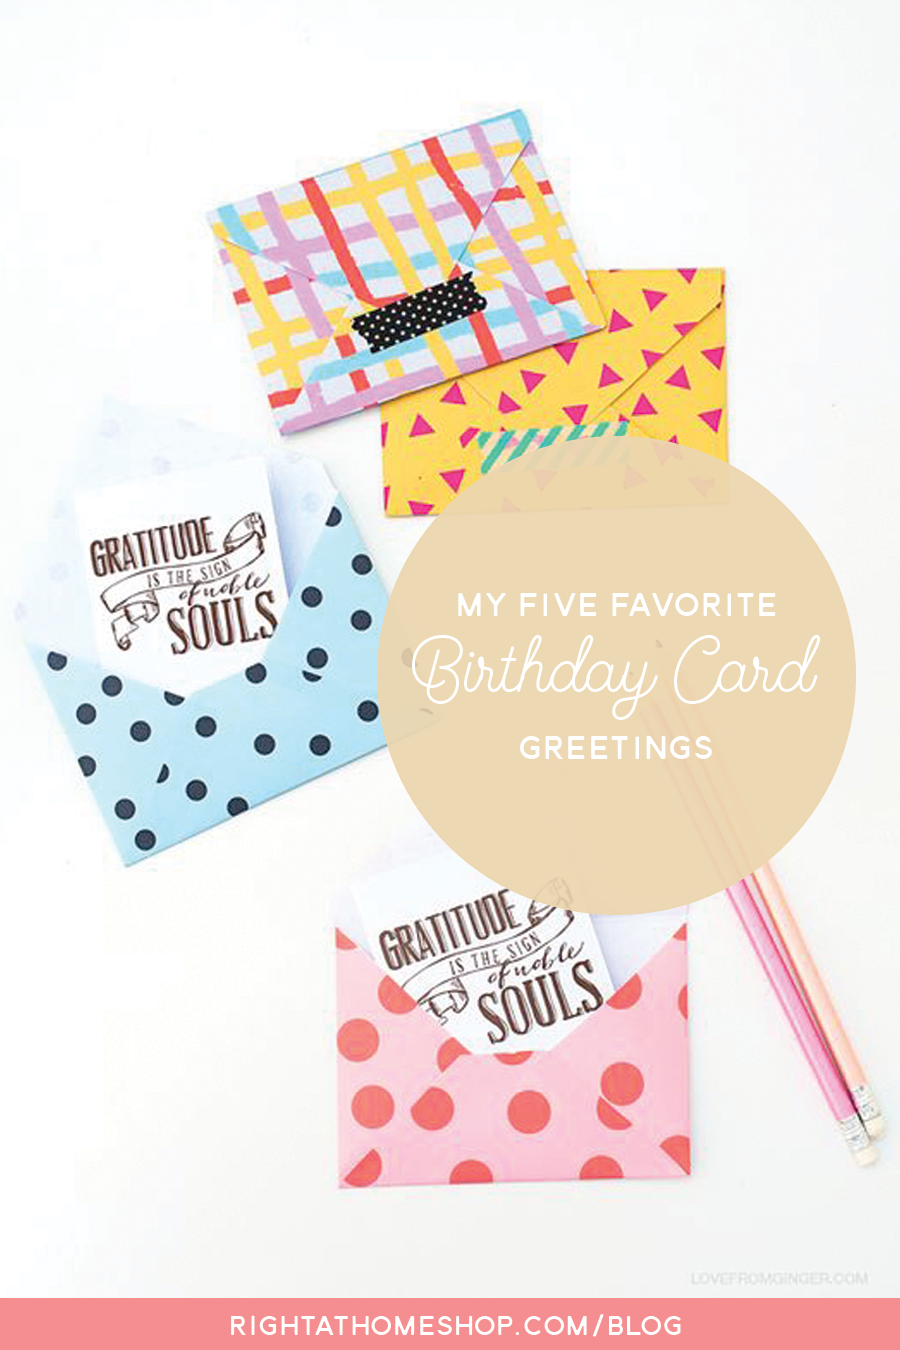 My 5 Favorite Greetings for Inside a Birthday Card // rightathomeshop.com/blog